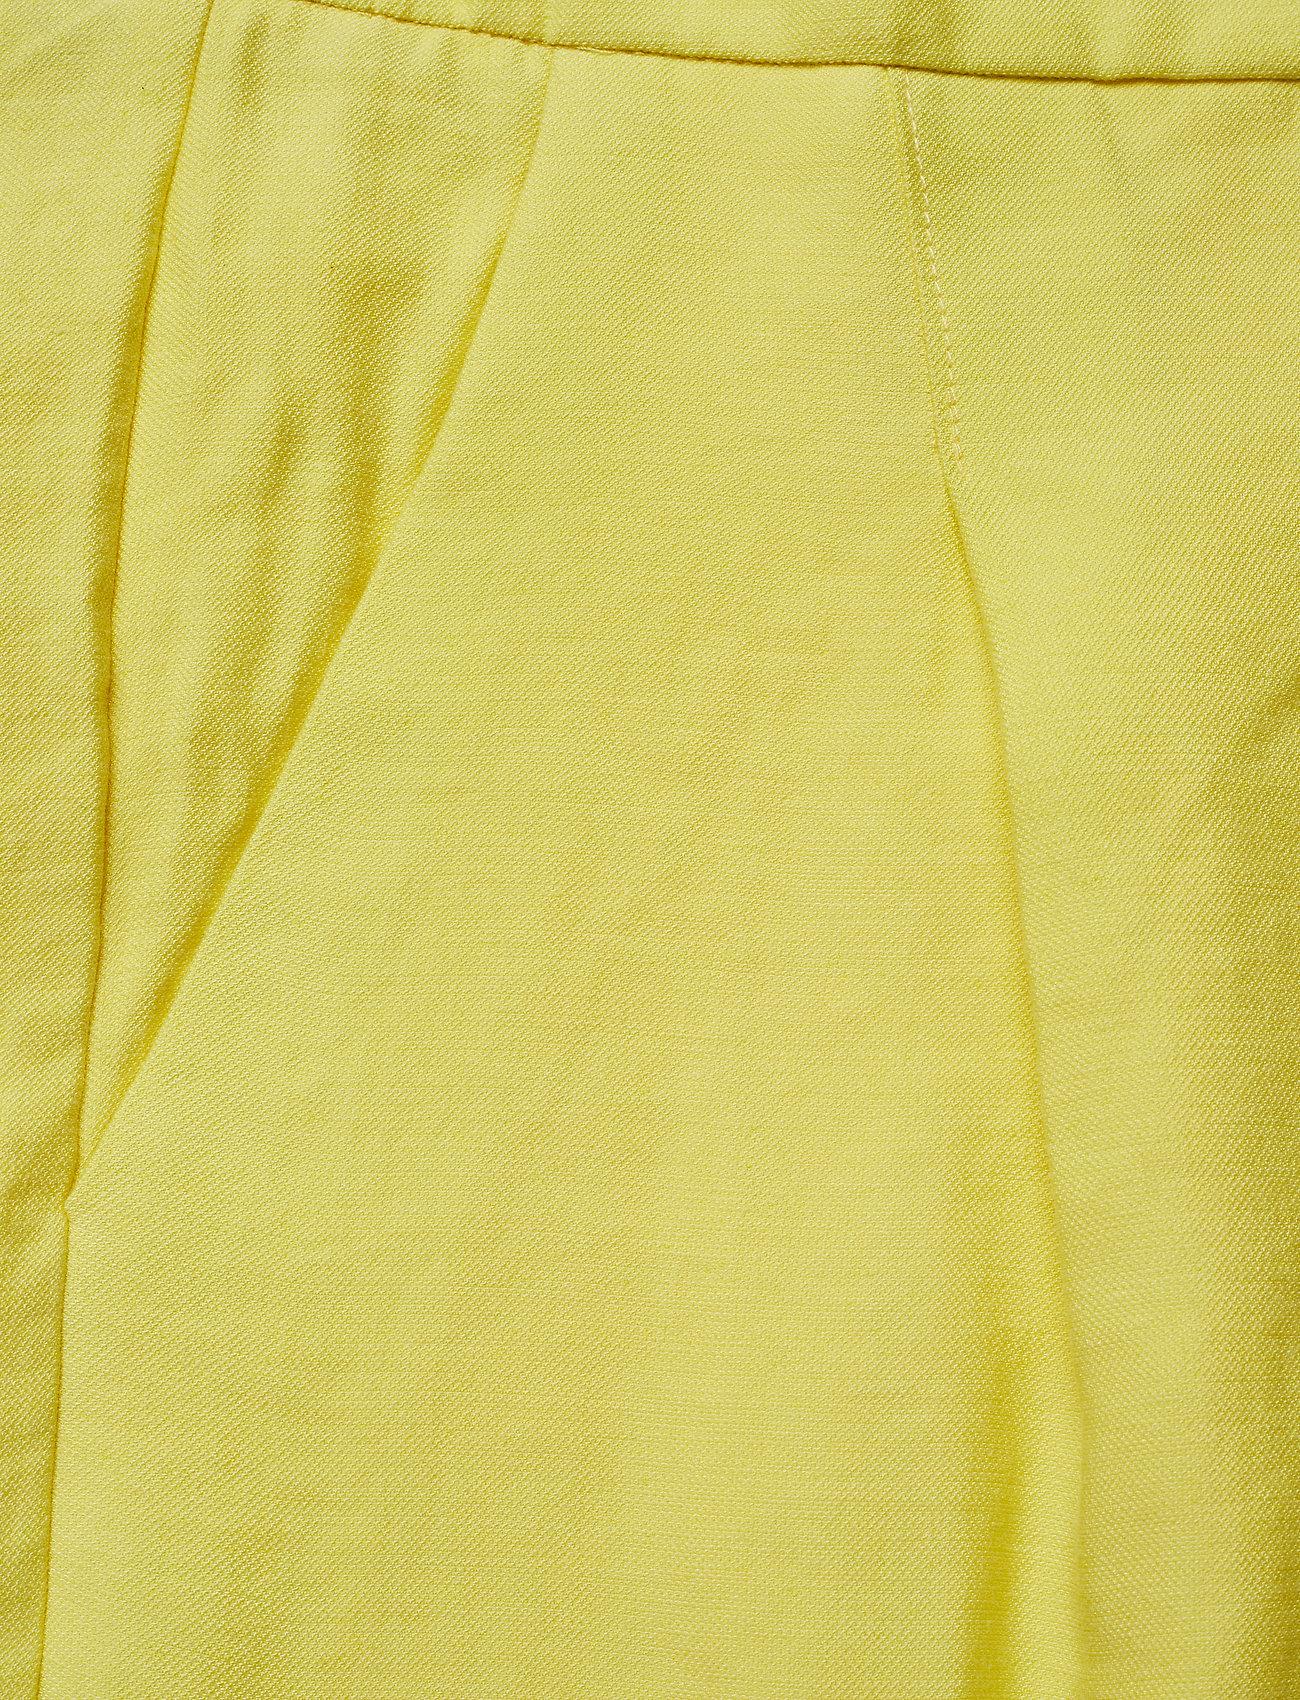 paaurora Glow Glow YellowStormamp; Marie paaurora YellowStormamp; DH2WIE9